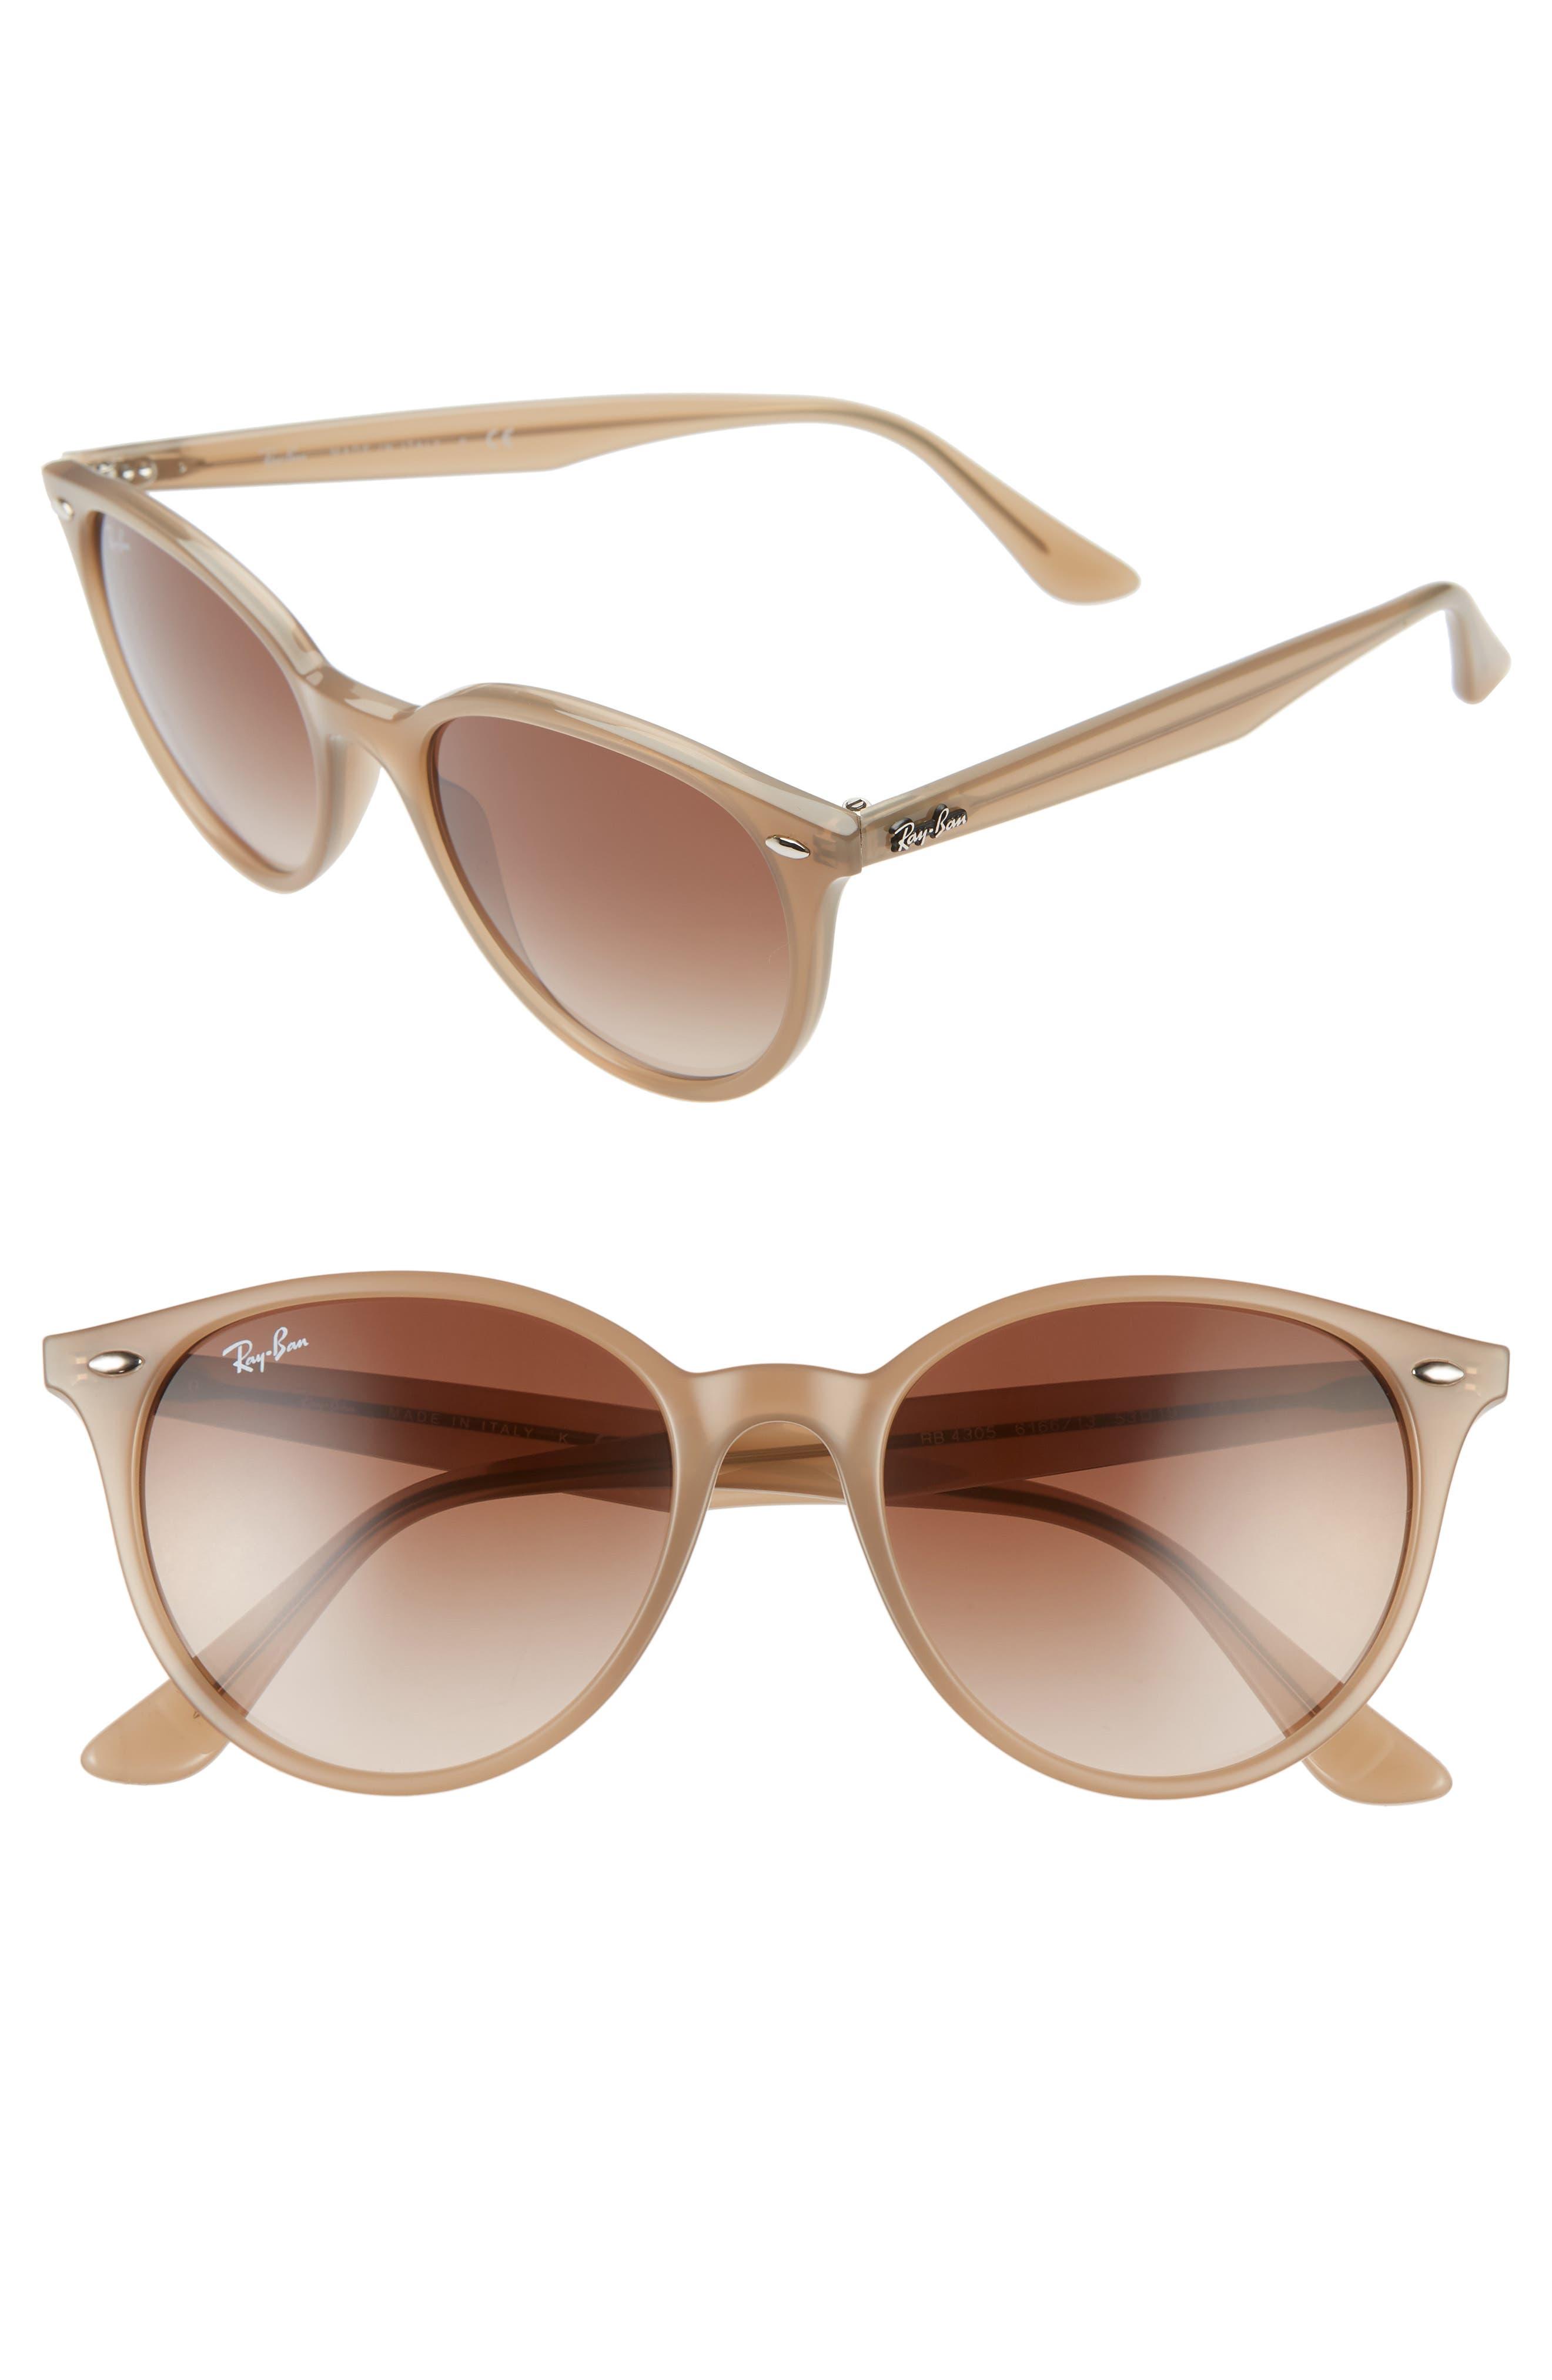 Ray-Ban Phantos 5m Round Sunglasses - Opal Beige/ Brown Gradient